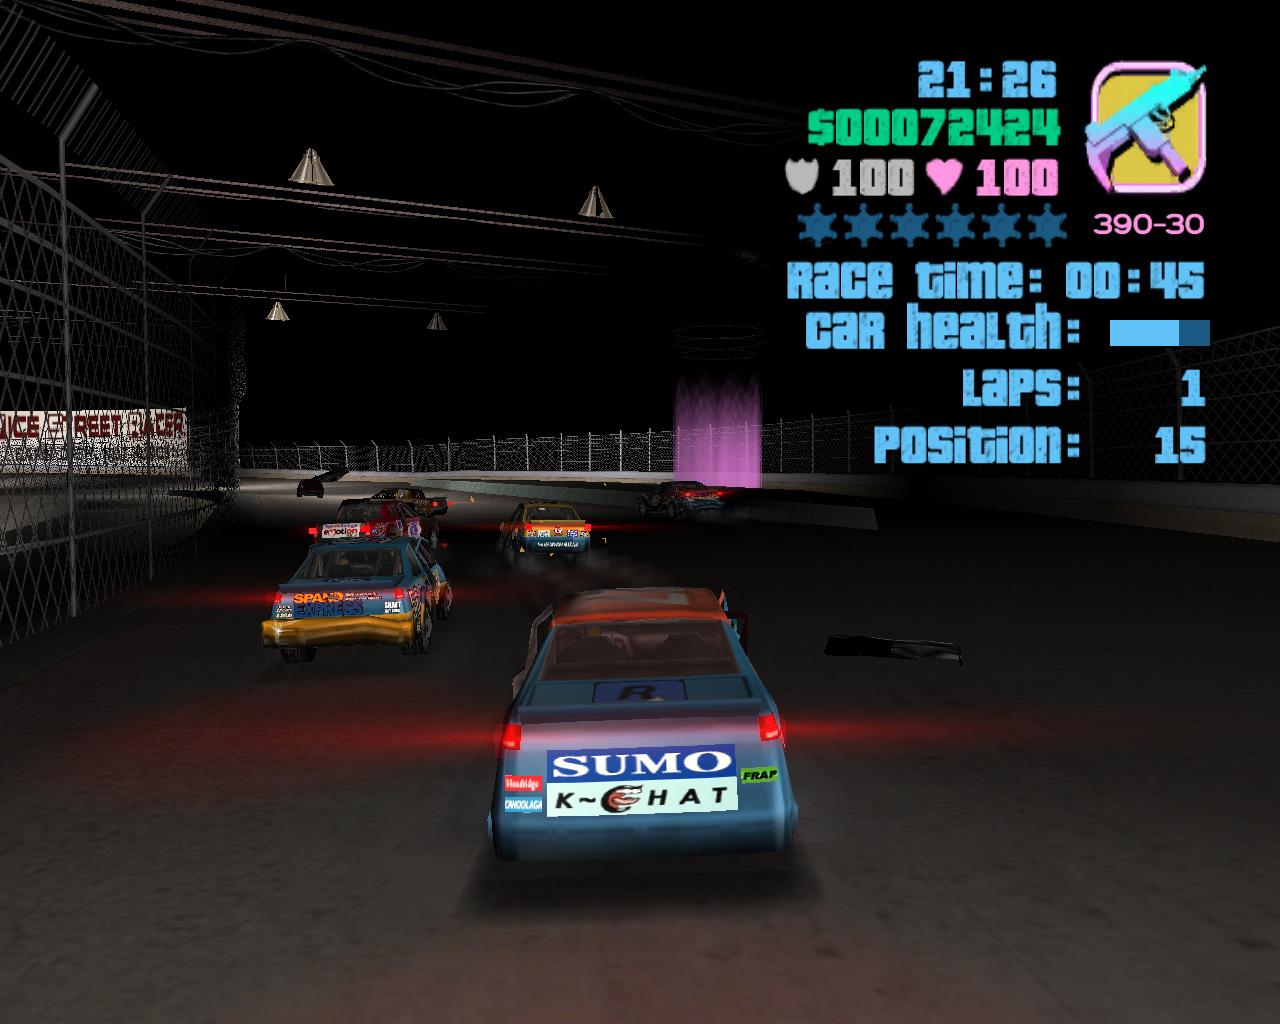 Hotringgtavcgameplay Gameplay Of Hotring In Gta Vice City